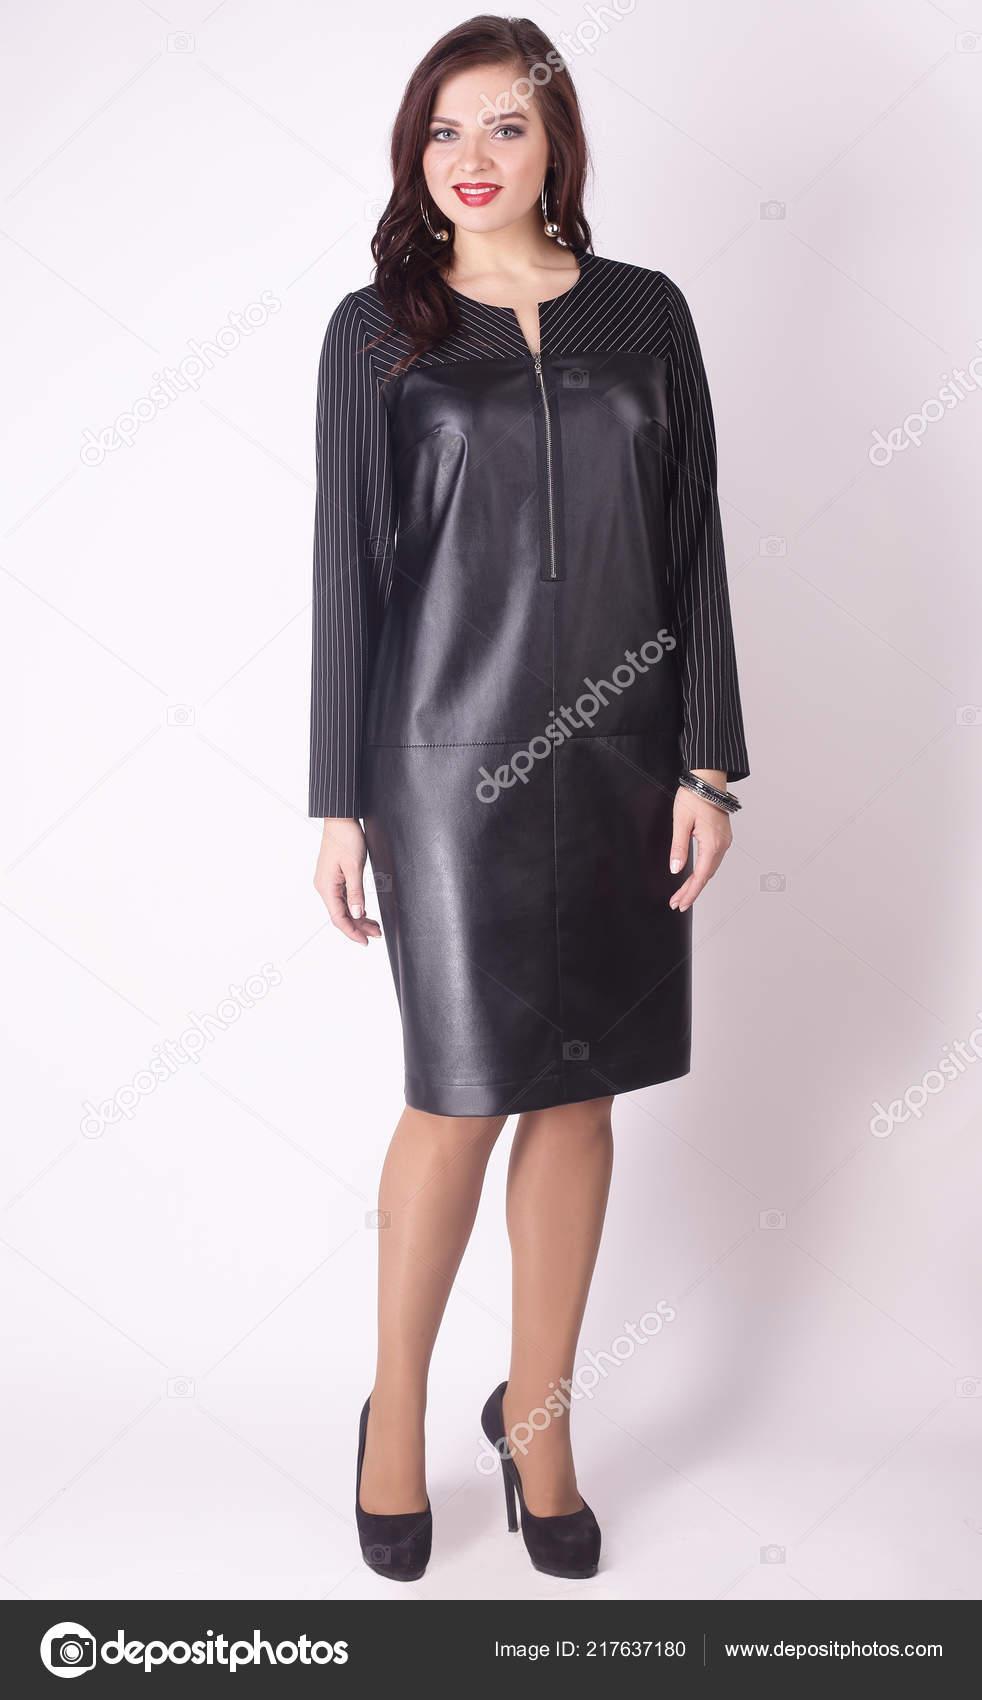 in full growth. modern woman model in a black leather dress .plus ...